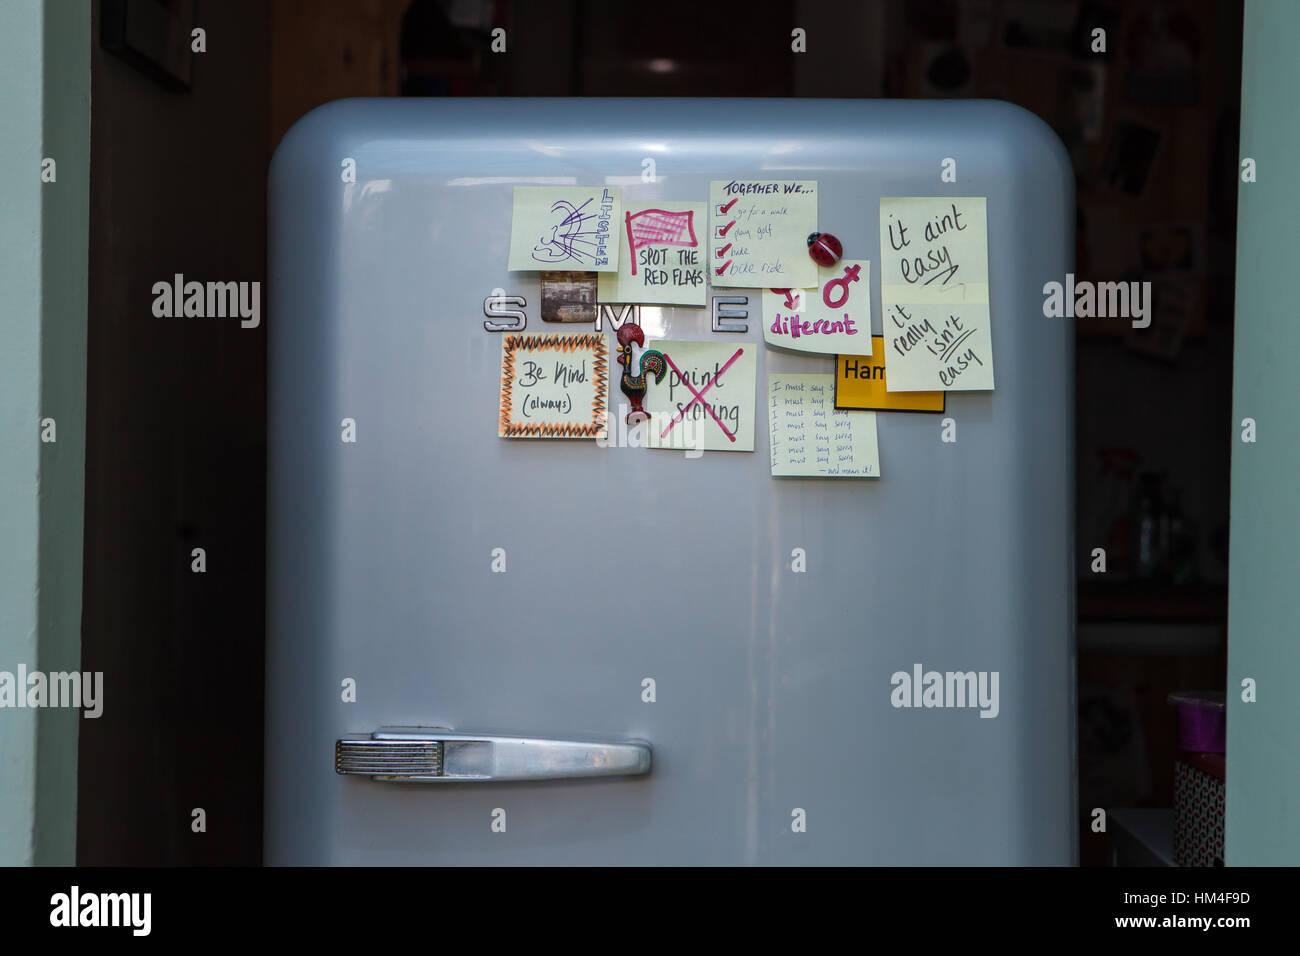 Smeg Kühlschrank Günstig : Smeg fab rgo standkühlschrank gold swarowski